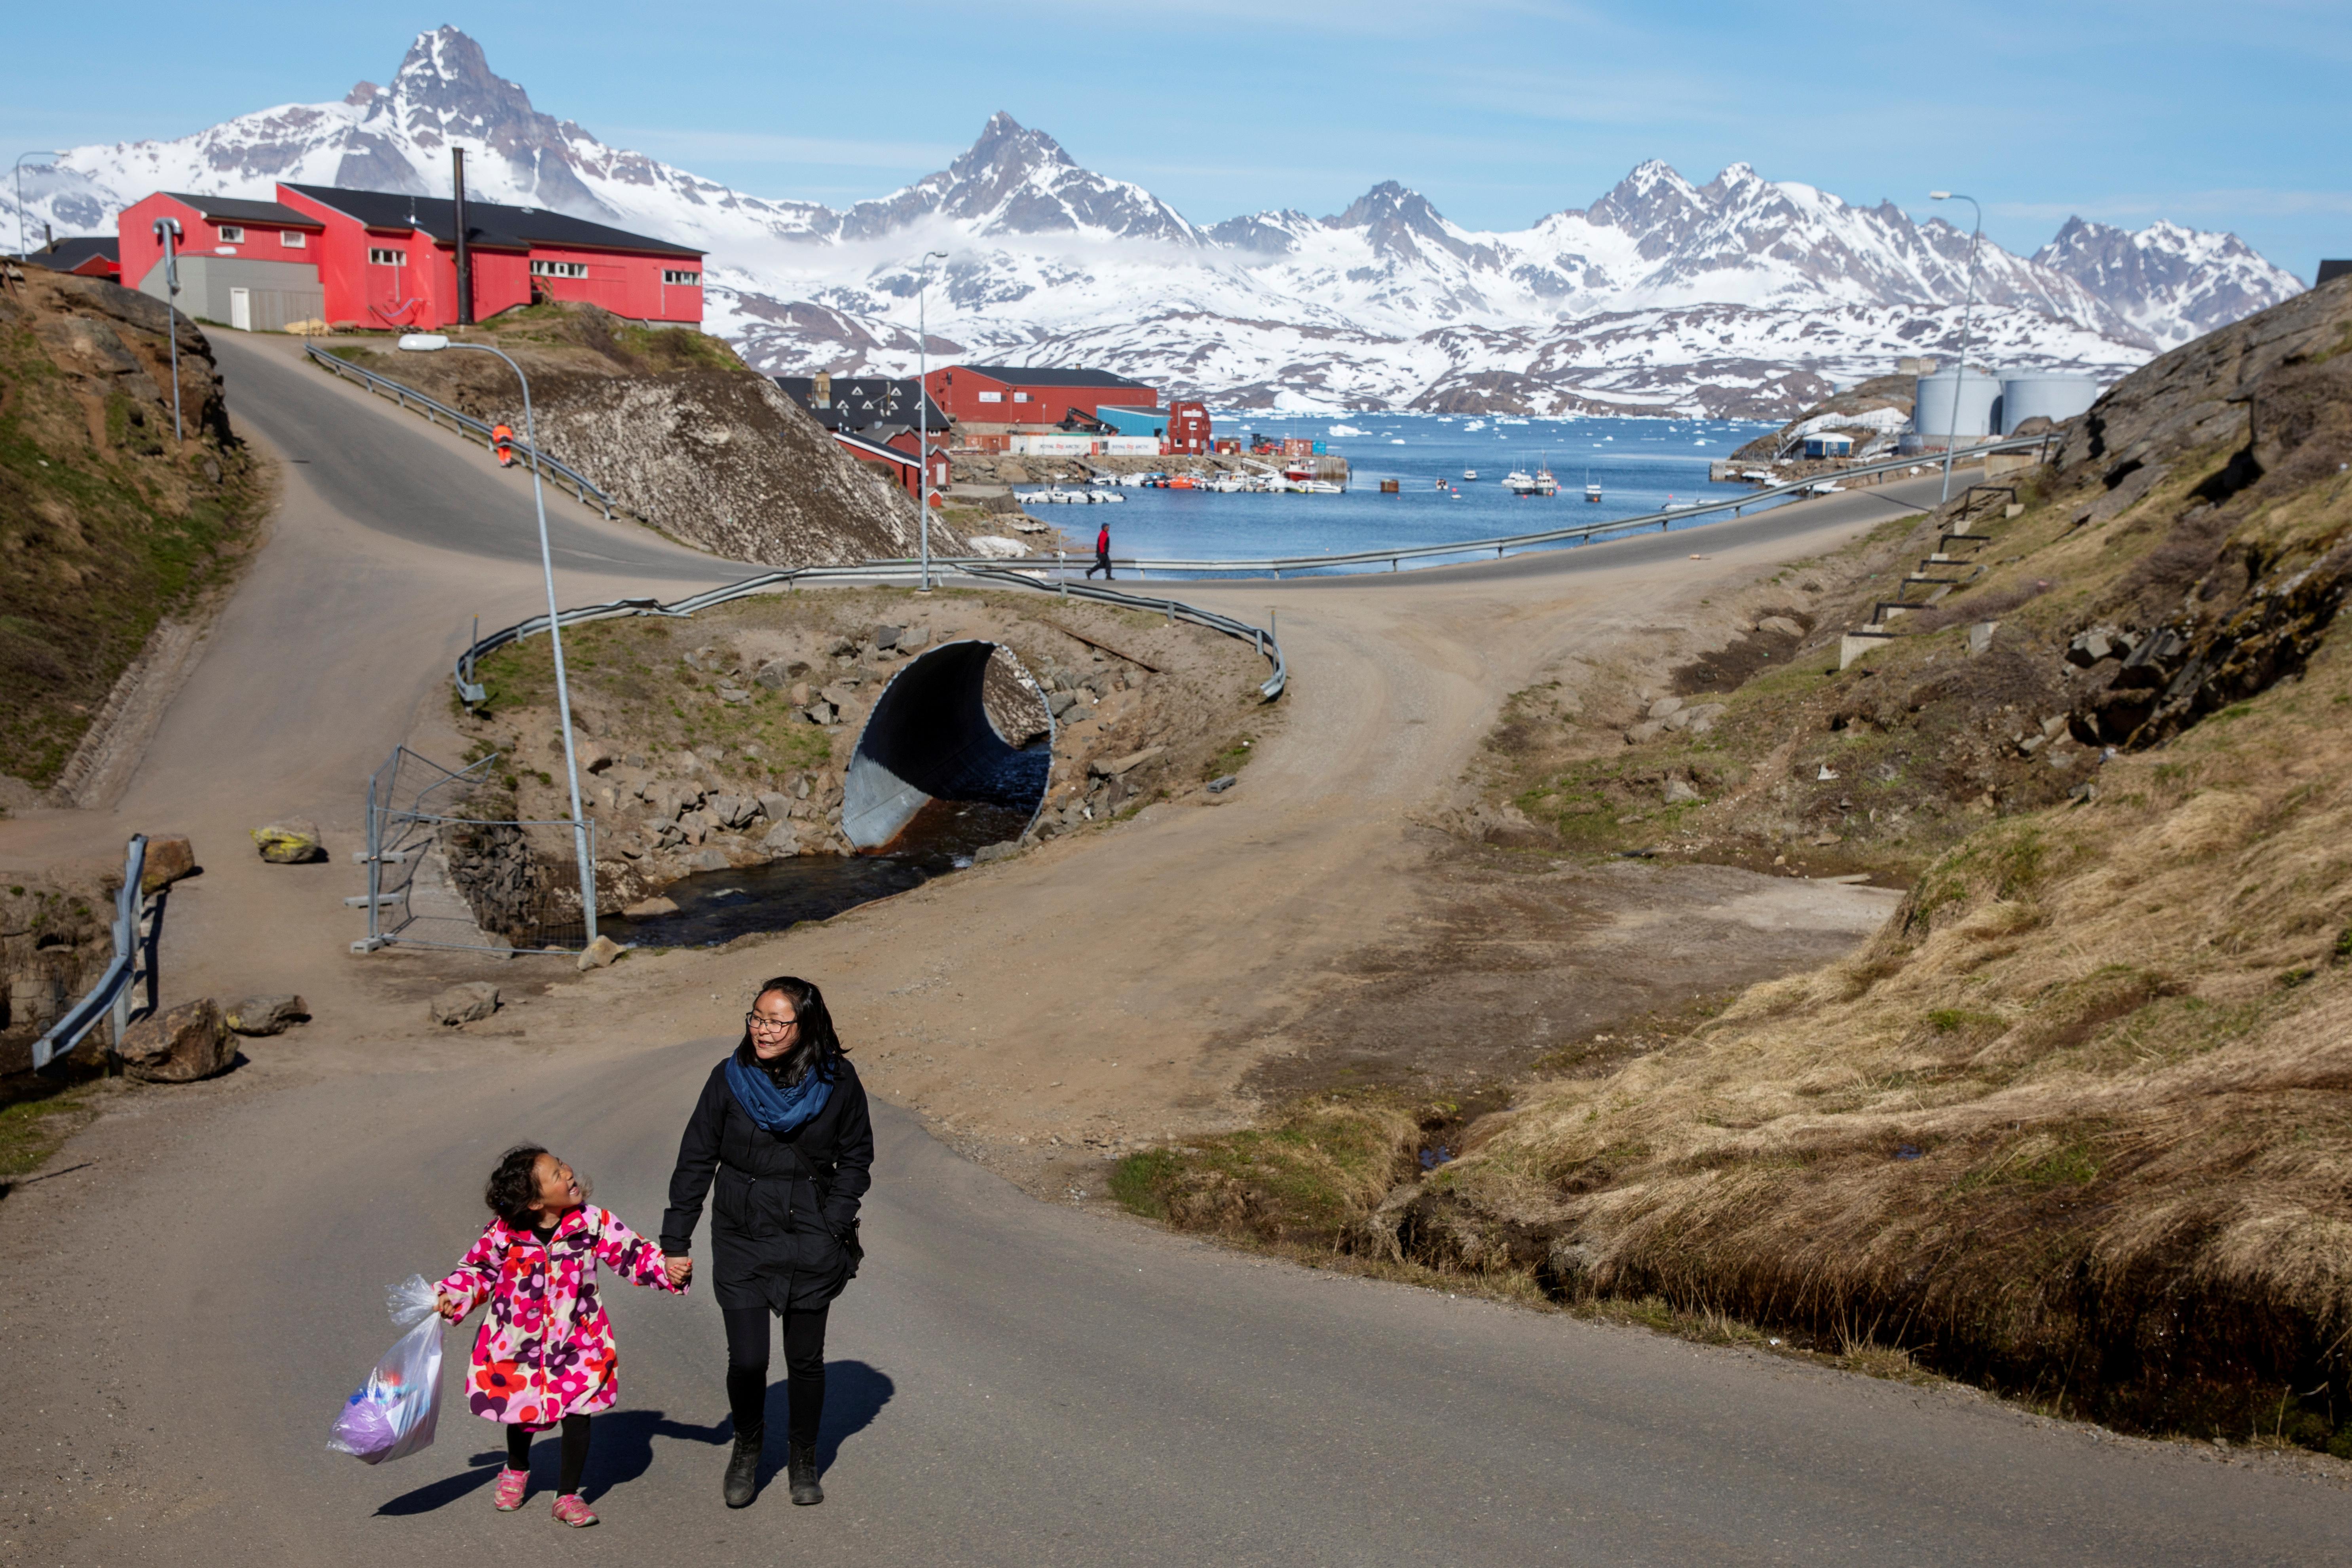 Washington Arctic experts say Trump's Greenland purchase idea ...